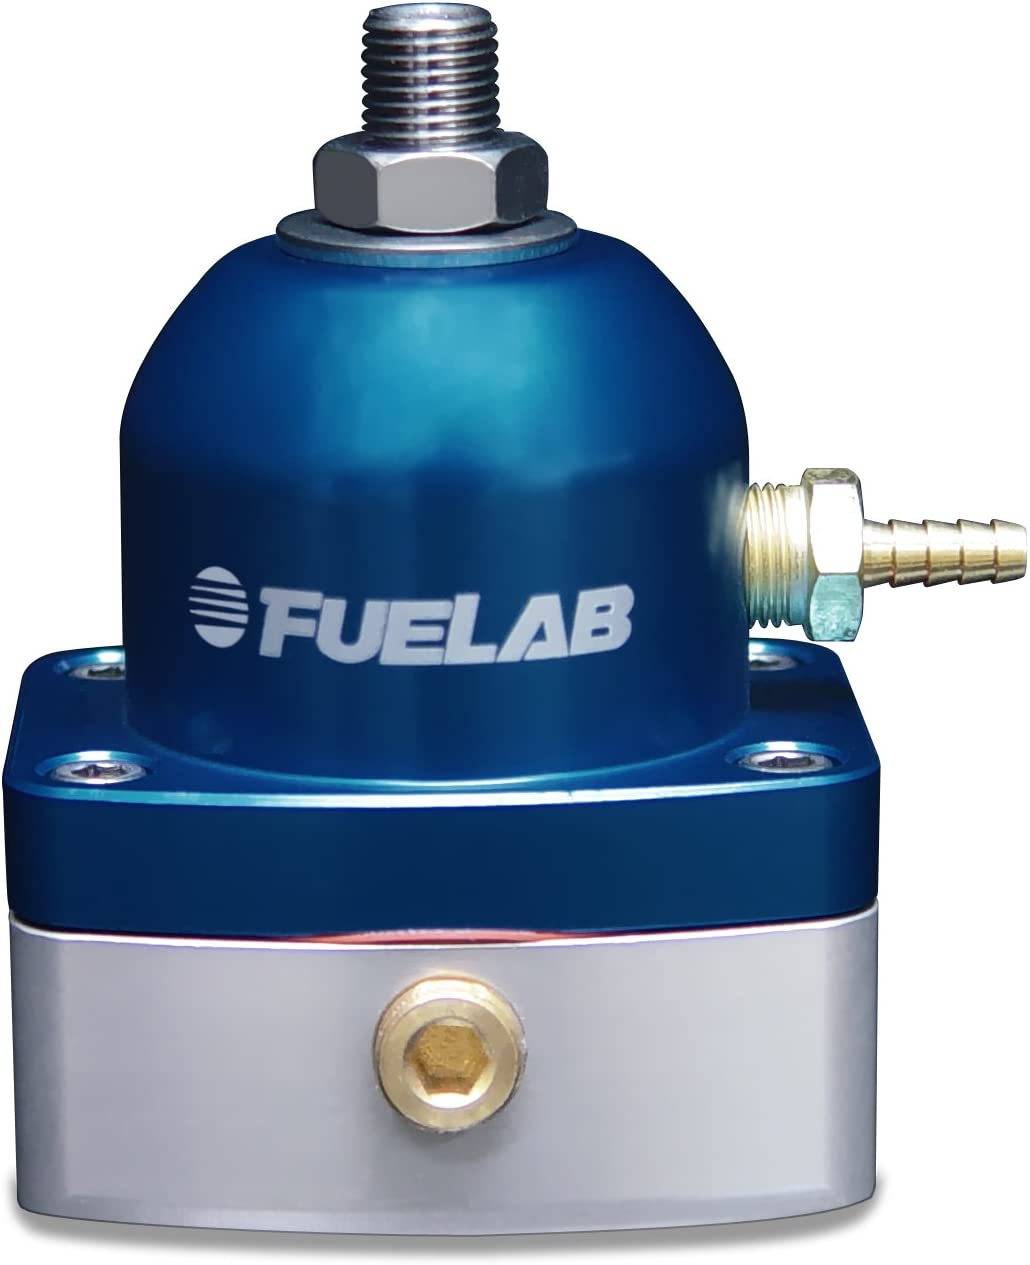 Fuelab 51502-3 Universal Blue EFI Fuel favorite Pressure Regul Industry No. 1 Adjustable